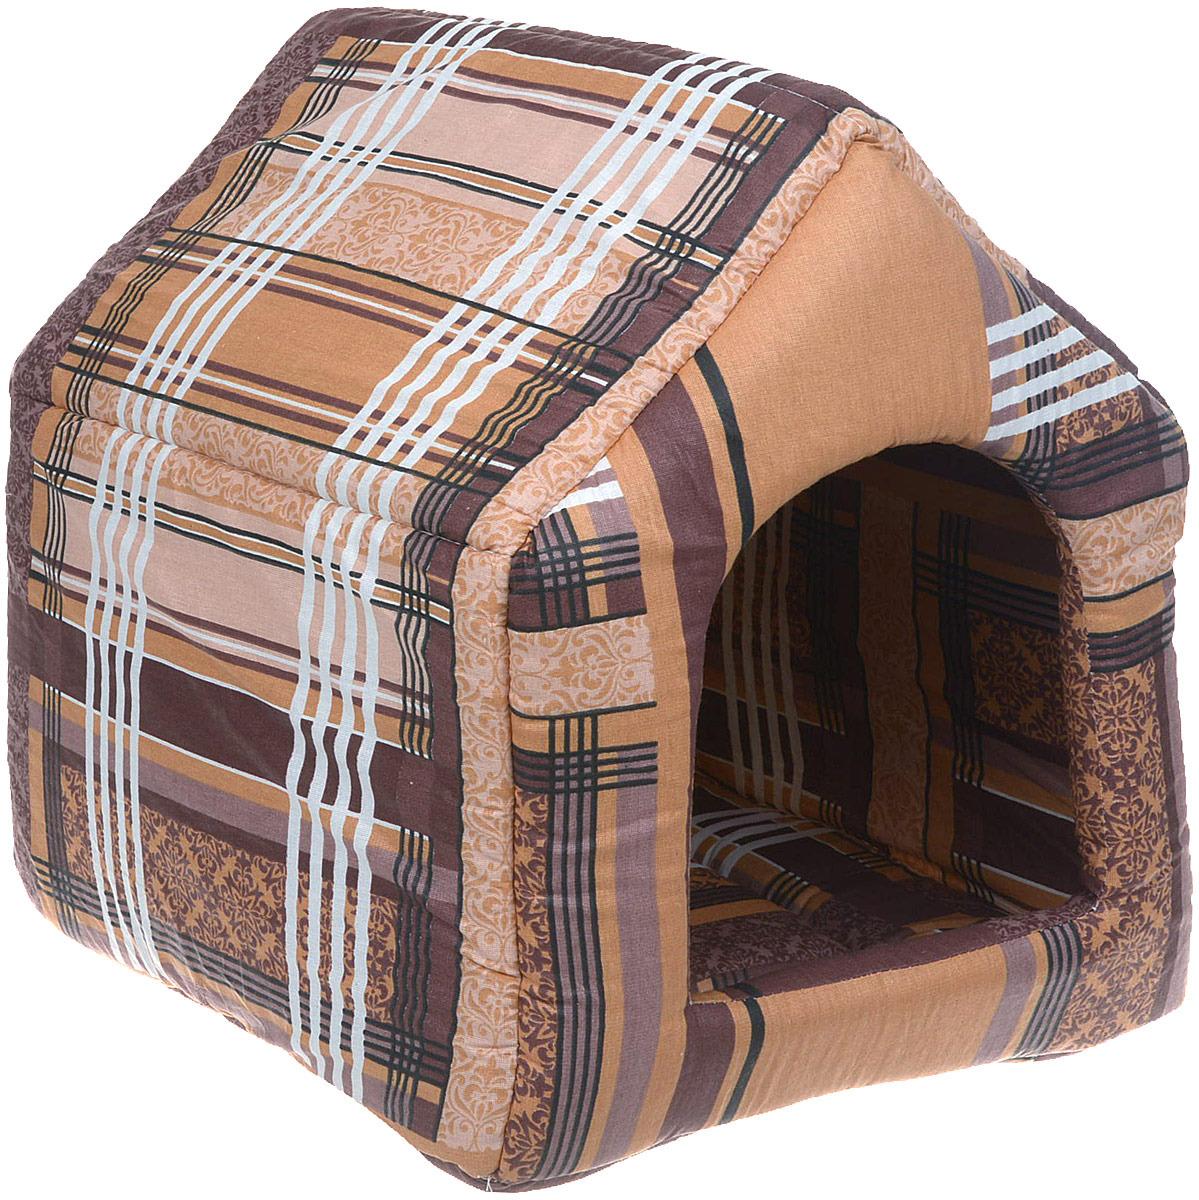 Лежак для животных ЗооМарк Домик-будка №2 Клетка, ЛД-2КБ, бежевый, 43 х 43 х 49 см